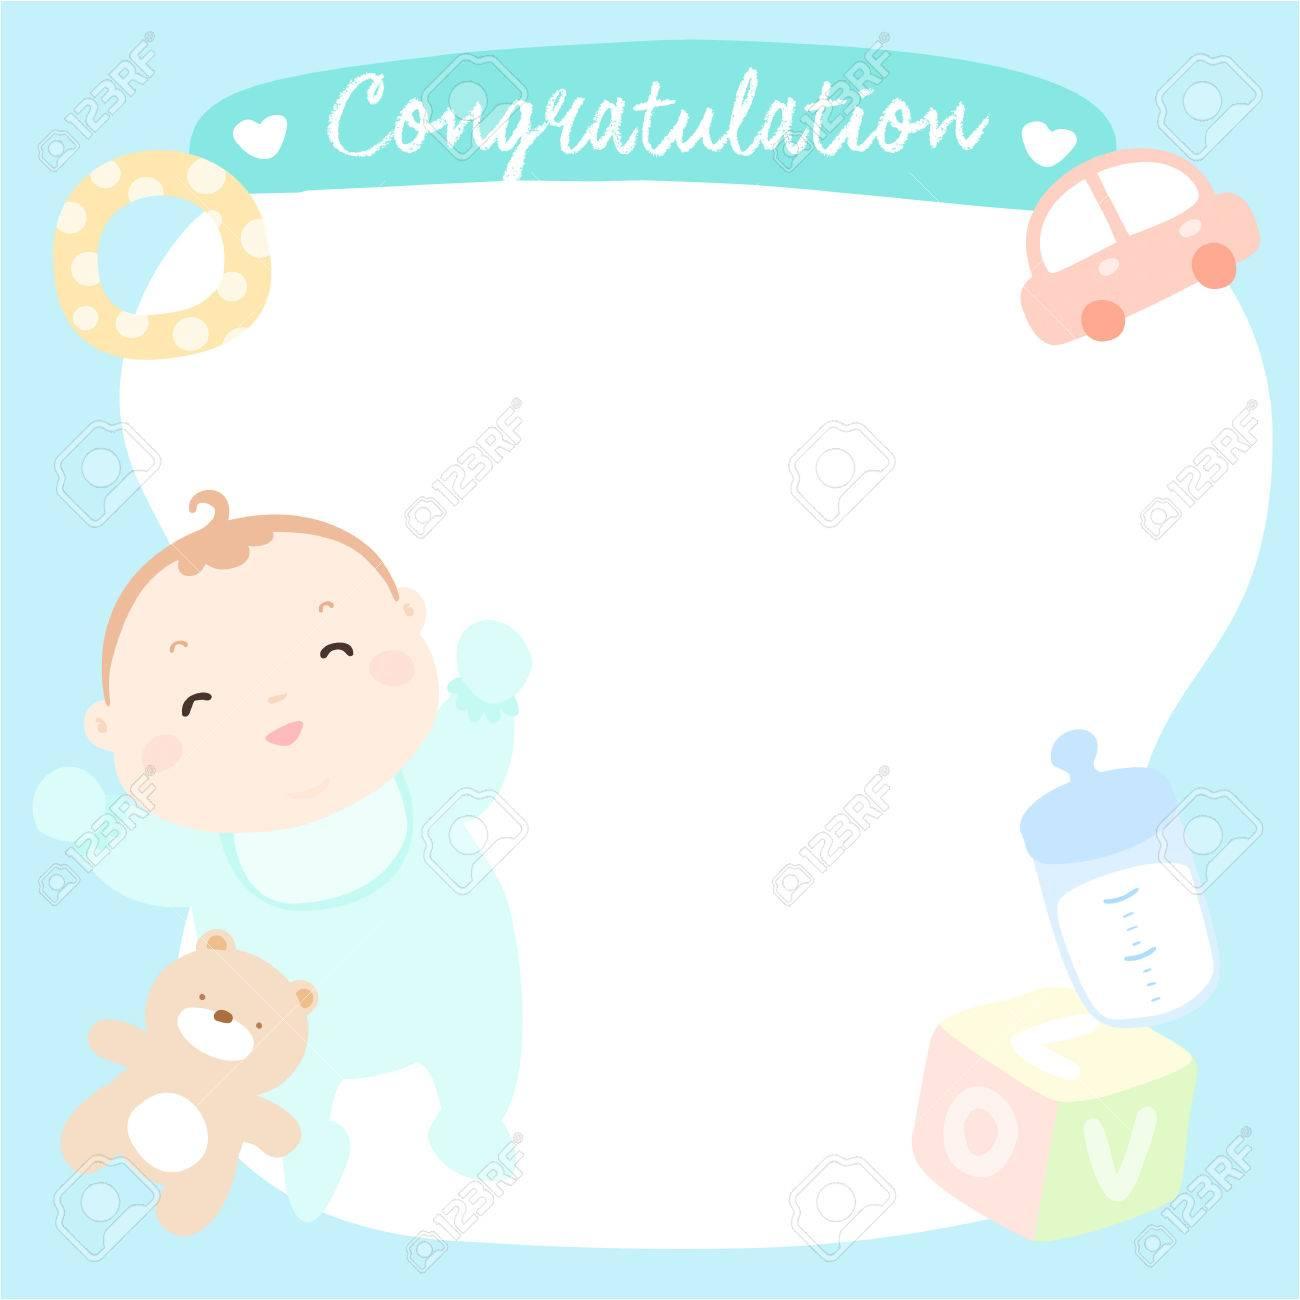 Cute Baby Boy On Empty Greeting Card Vector Illustration Royalty